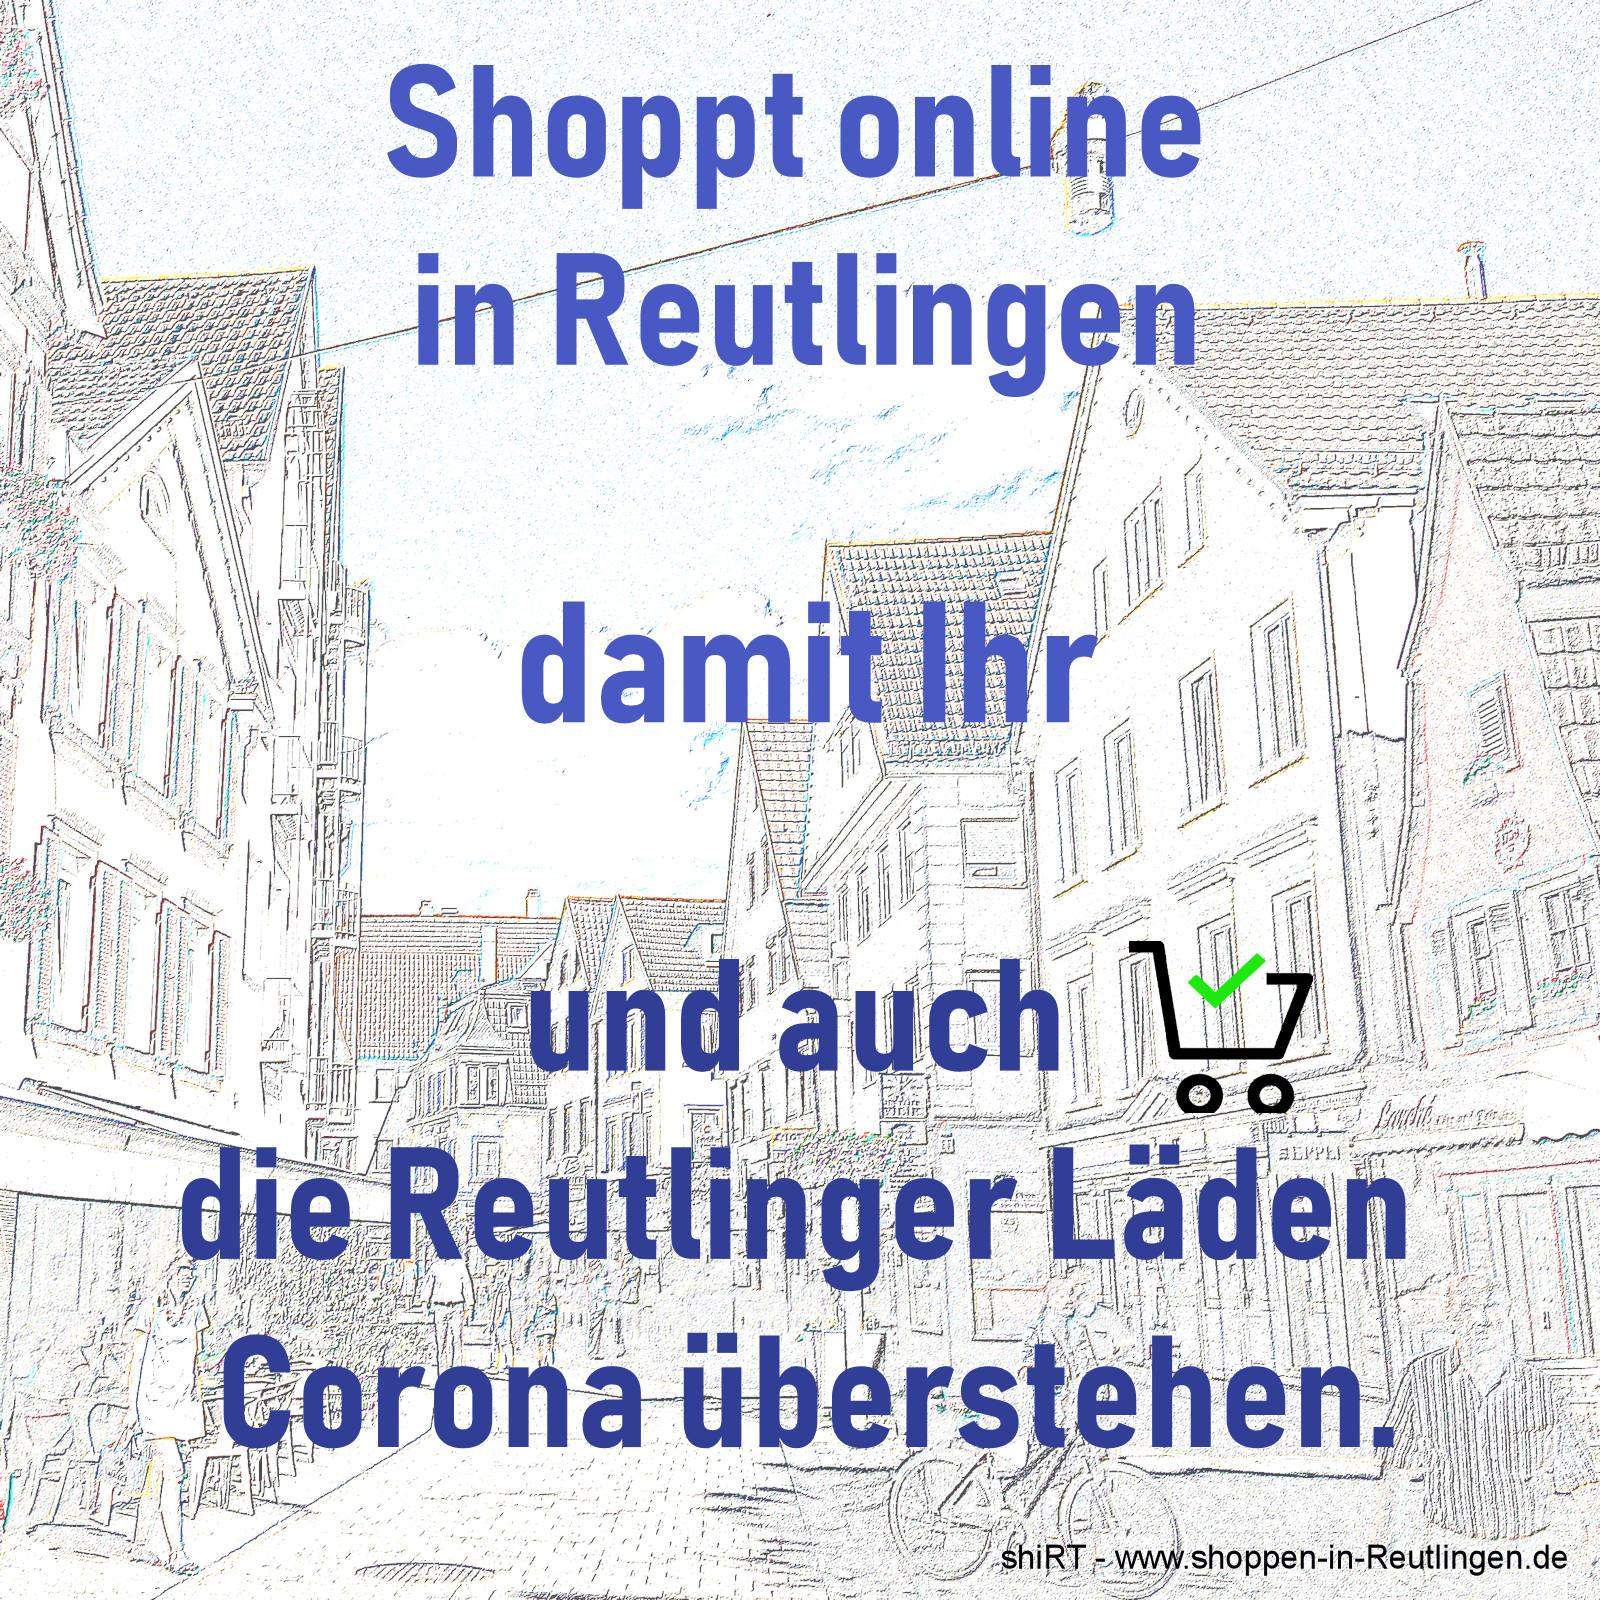 Onlineshops und Onlinehändler in Reutlingen